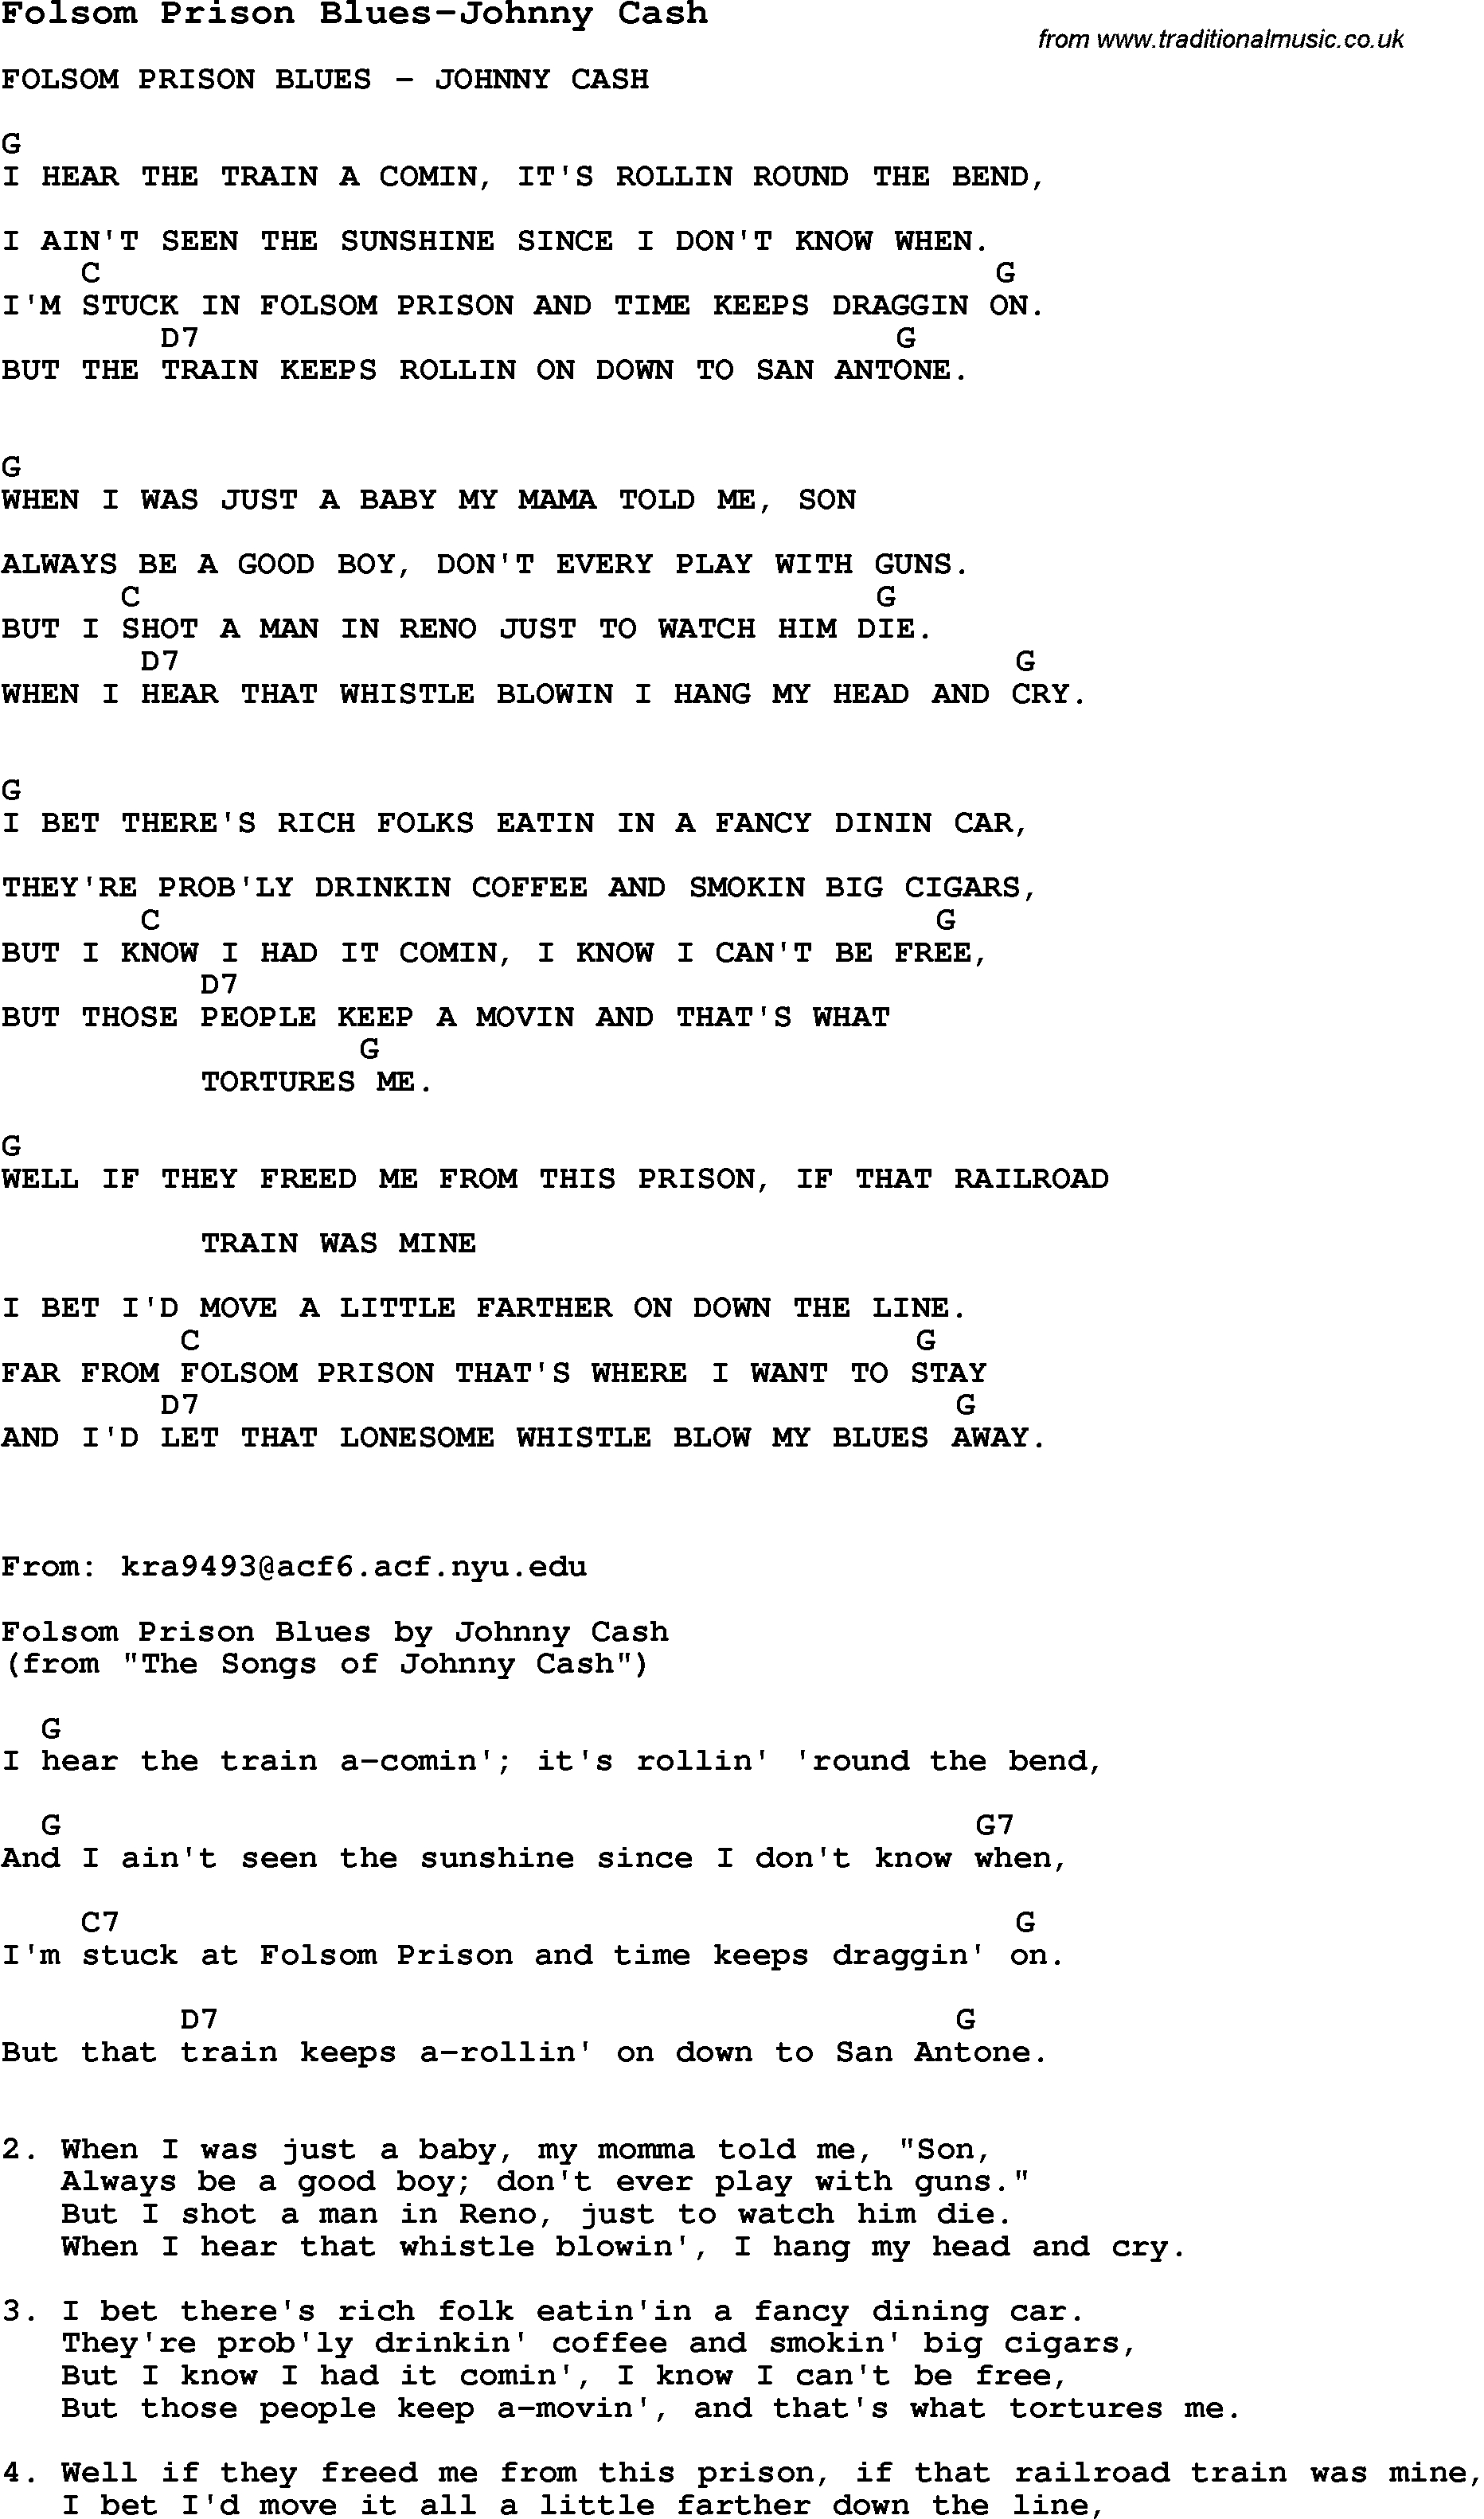 Folsom Prison Blues Chords Blues Guitar Lesson For Folsom Prison Blues Johnny Cash With Chords